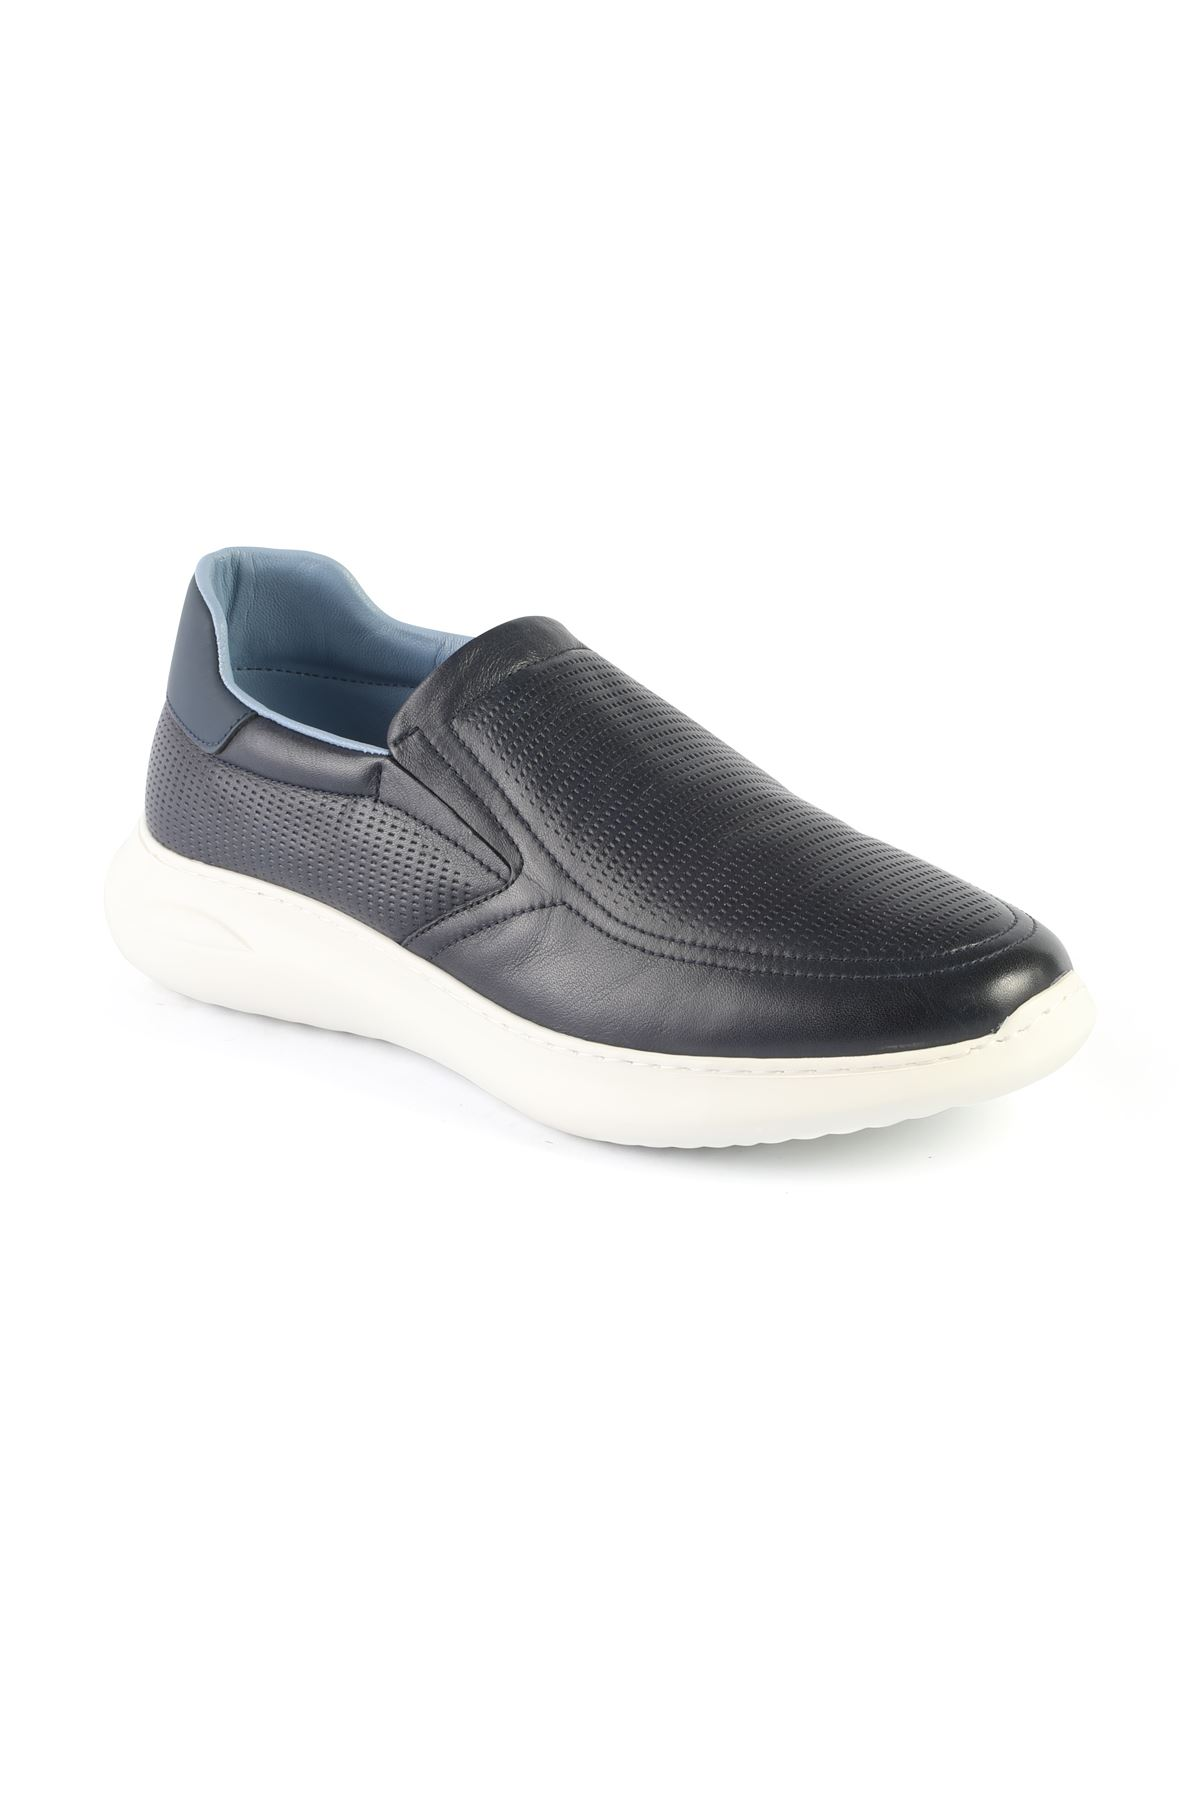 Libero L3413 Lacivert Spor Ayakkabı